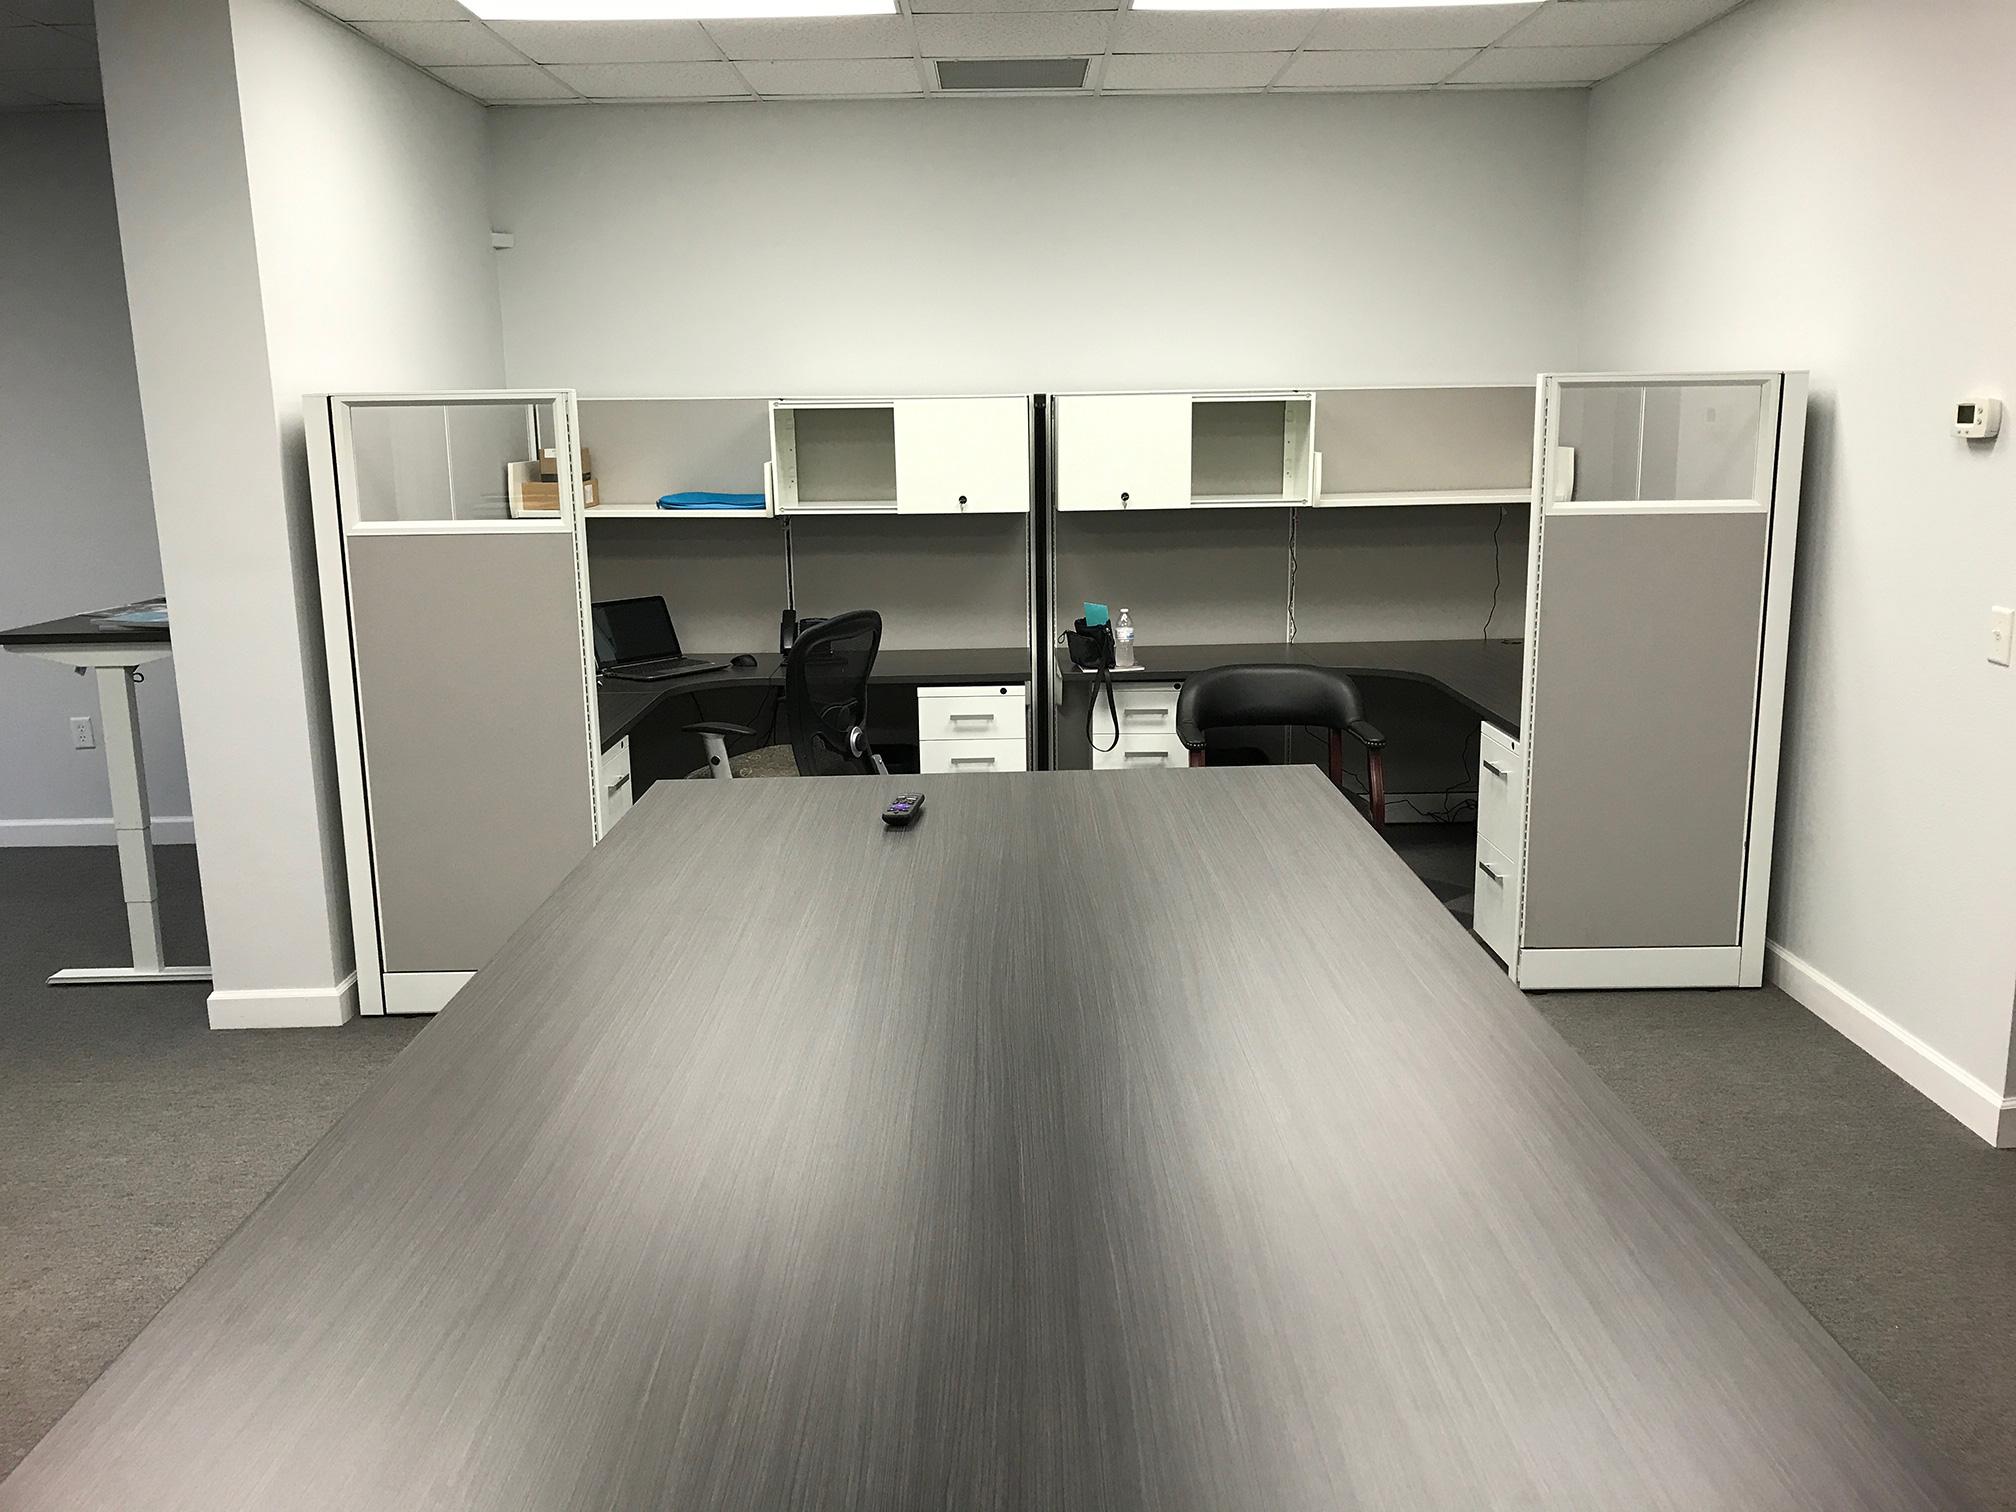 office-space-workstations-manasota-office-supplies-llc.jpg